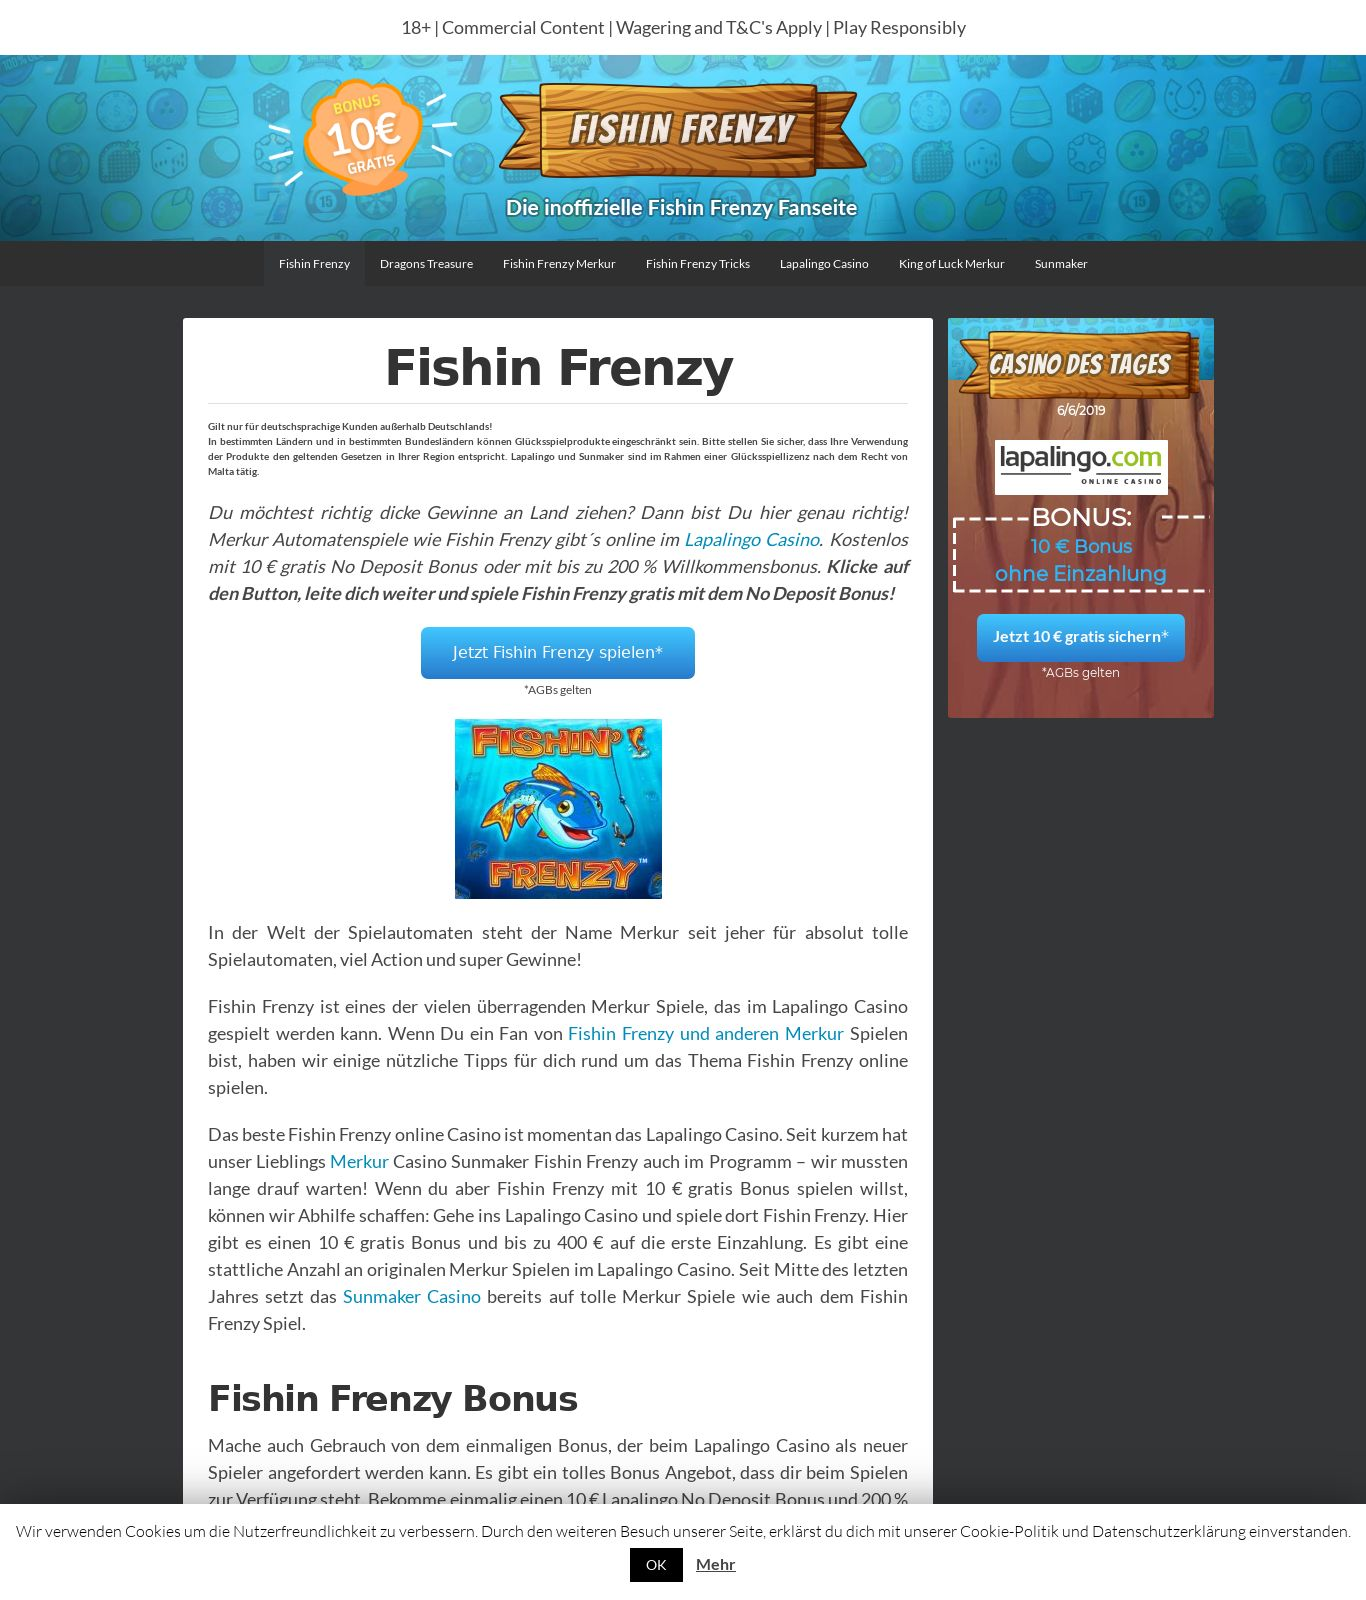 Fish In Frenzy Casino Review Scam Report Fishinfrenzy Net Jun